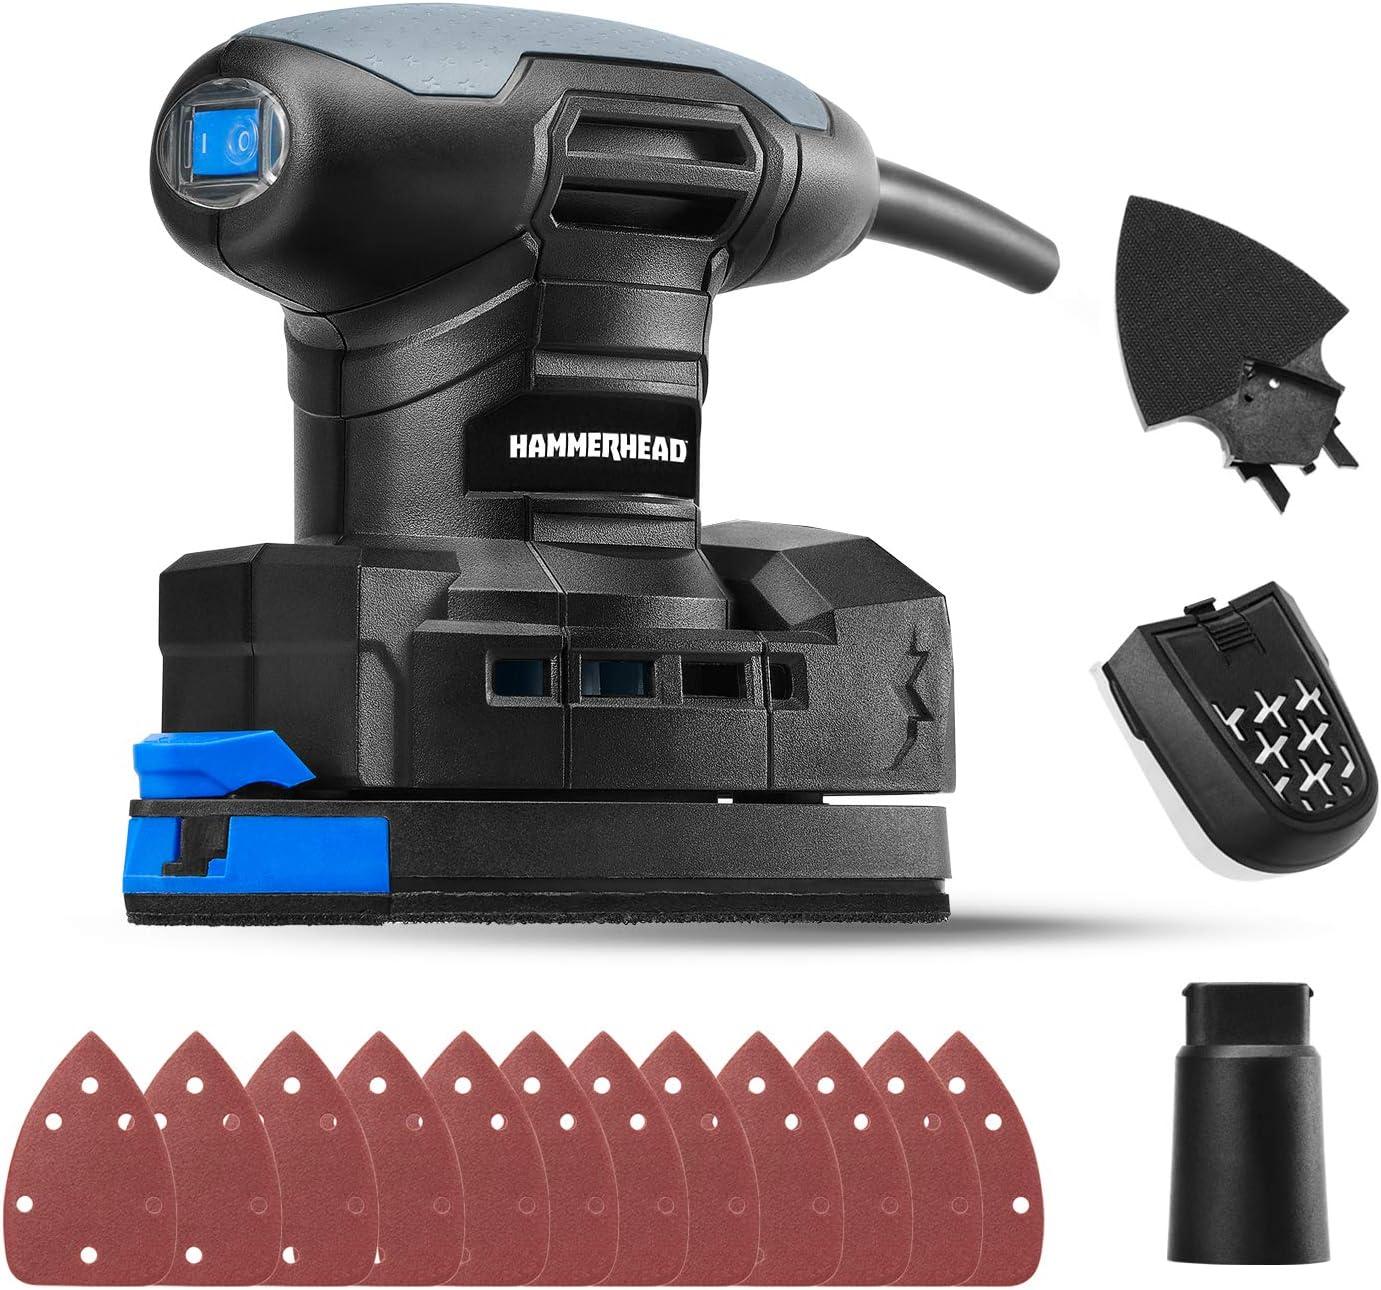 Hammerhead HADS014 1.4-Amp Multi-Function Detail Sander $20 Coupon